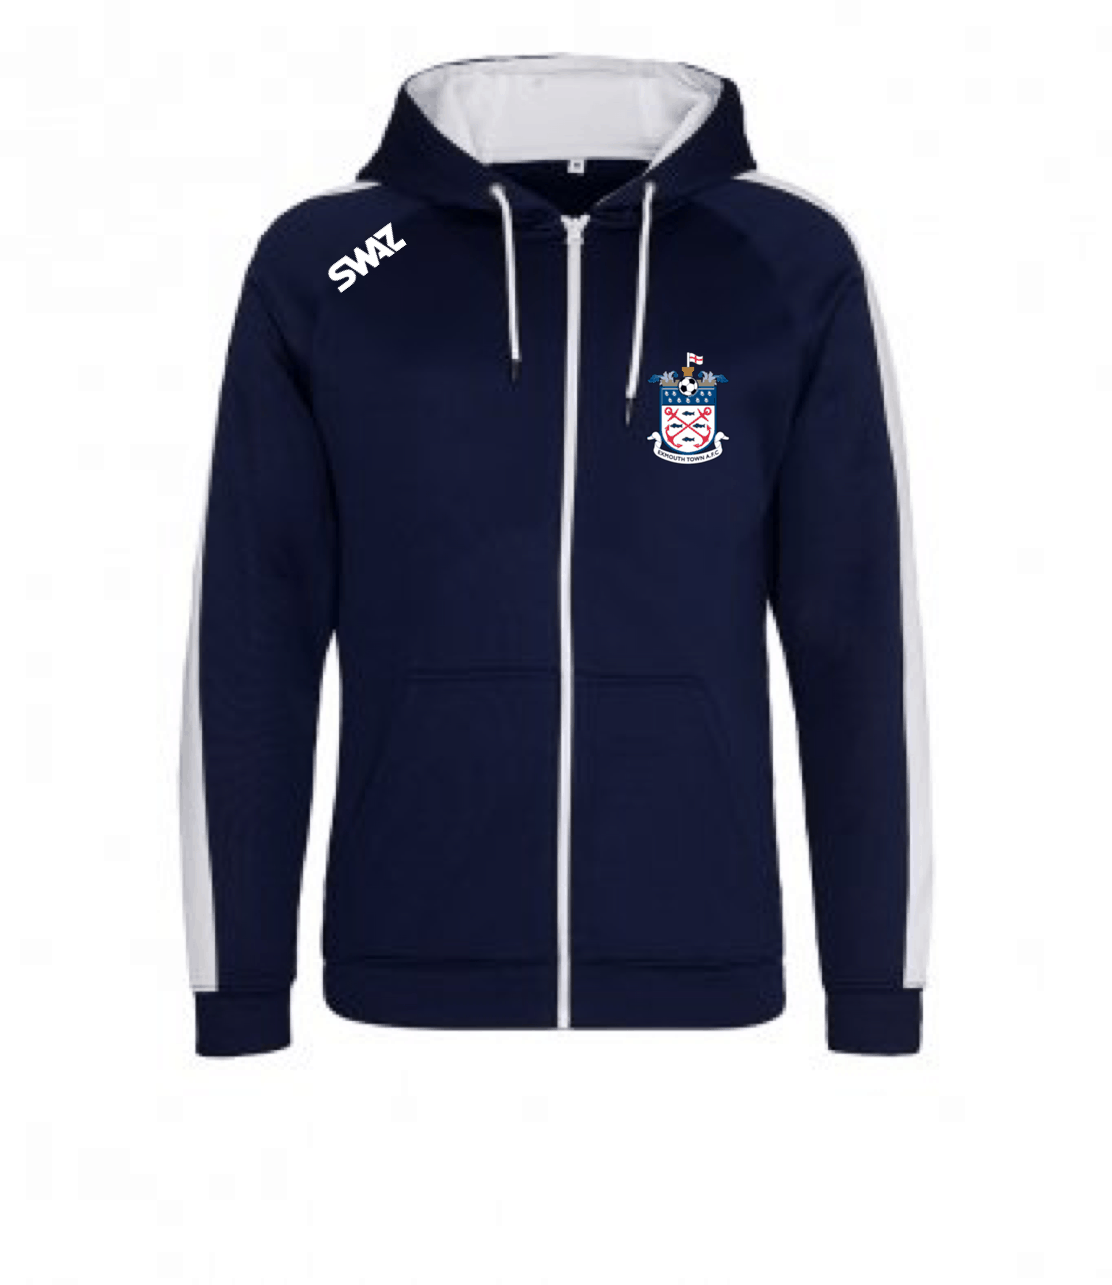 Exmouth Town Zip Hoody   SWAZ Teamwear   Football Kit Supplier